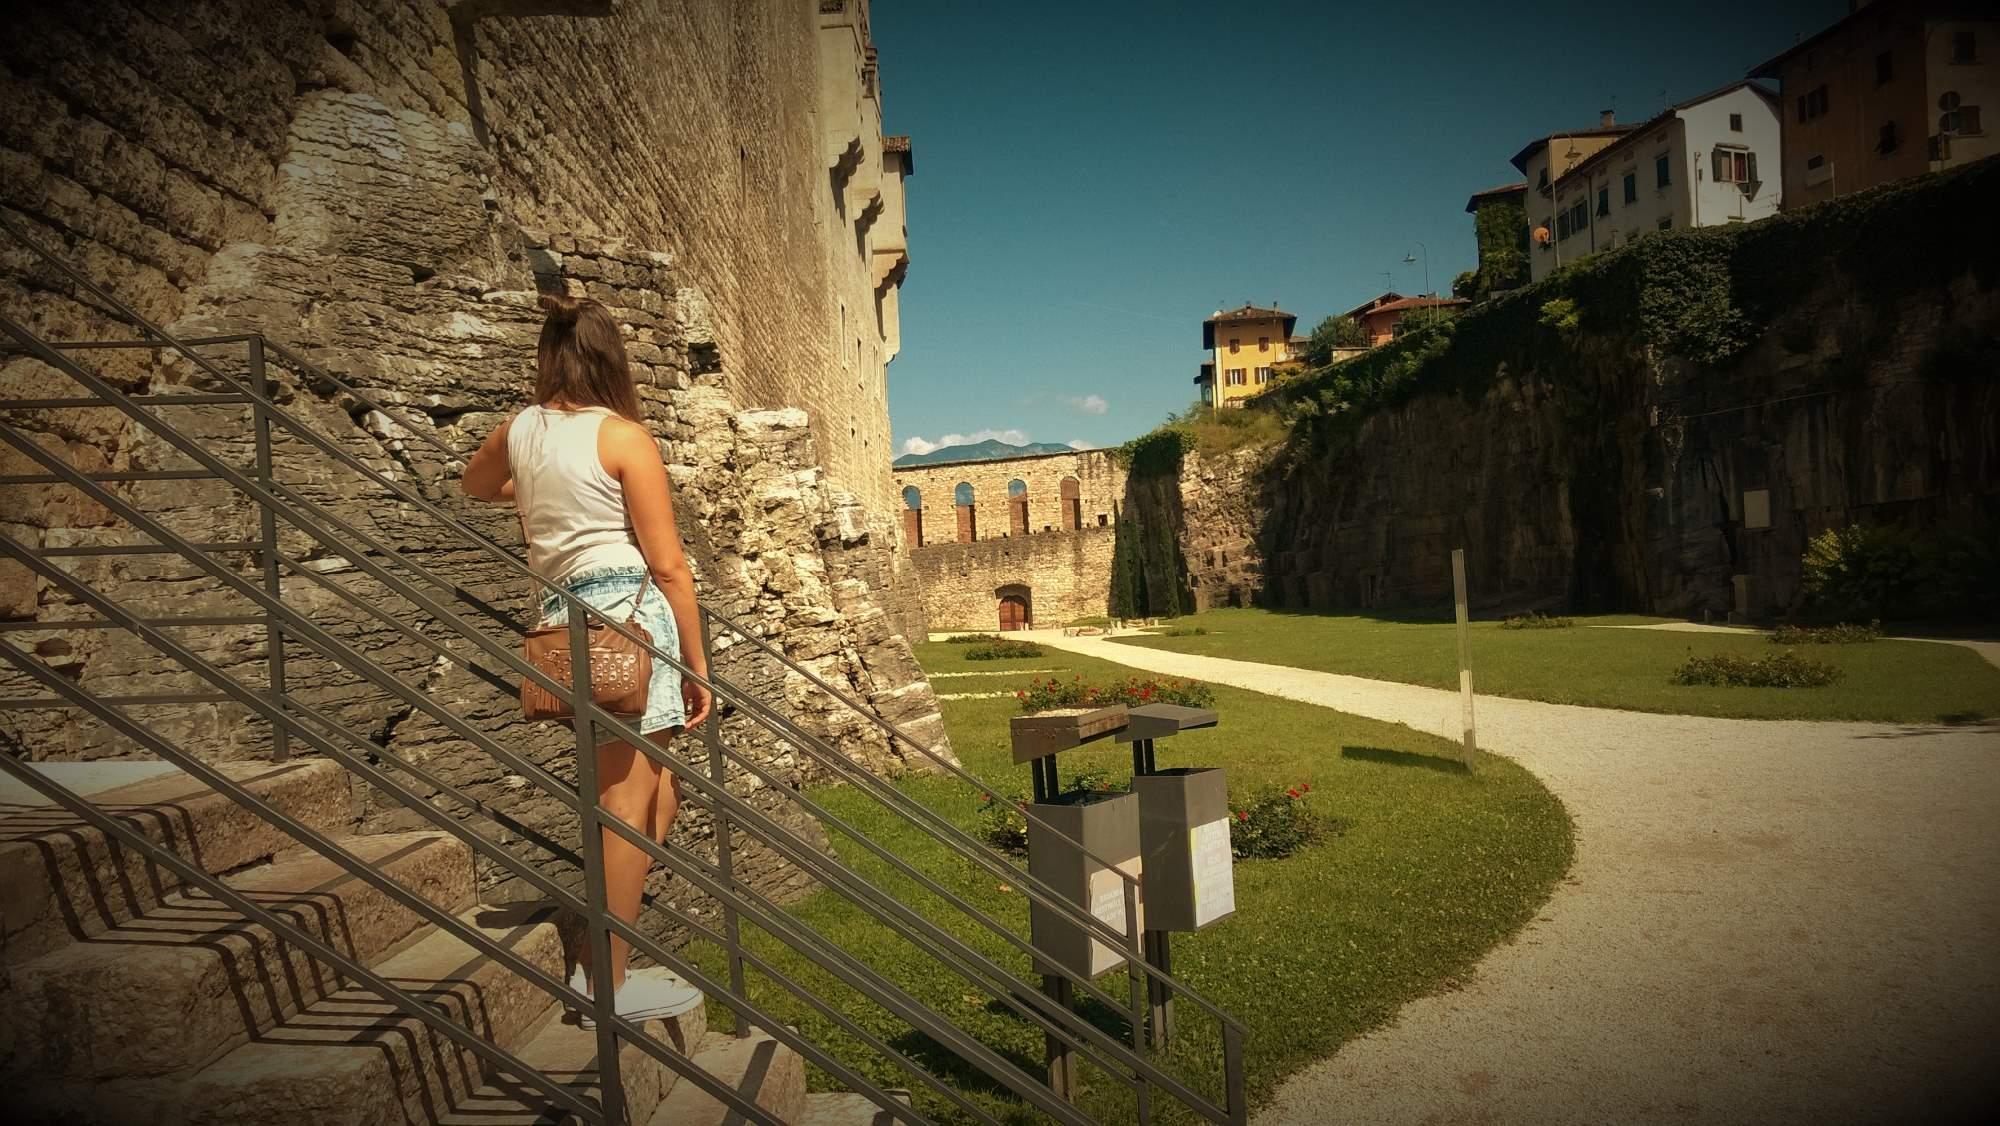 http://img22.rajce.idnes.cz/d2201/13/13110/13110056_85ca4ba35a019d03533c343bf615fafa/images/trento-castello.jpg